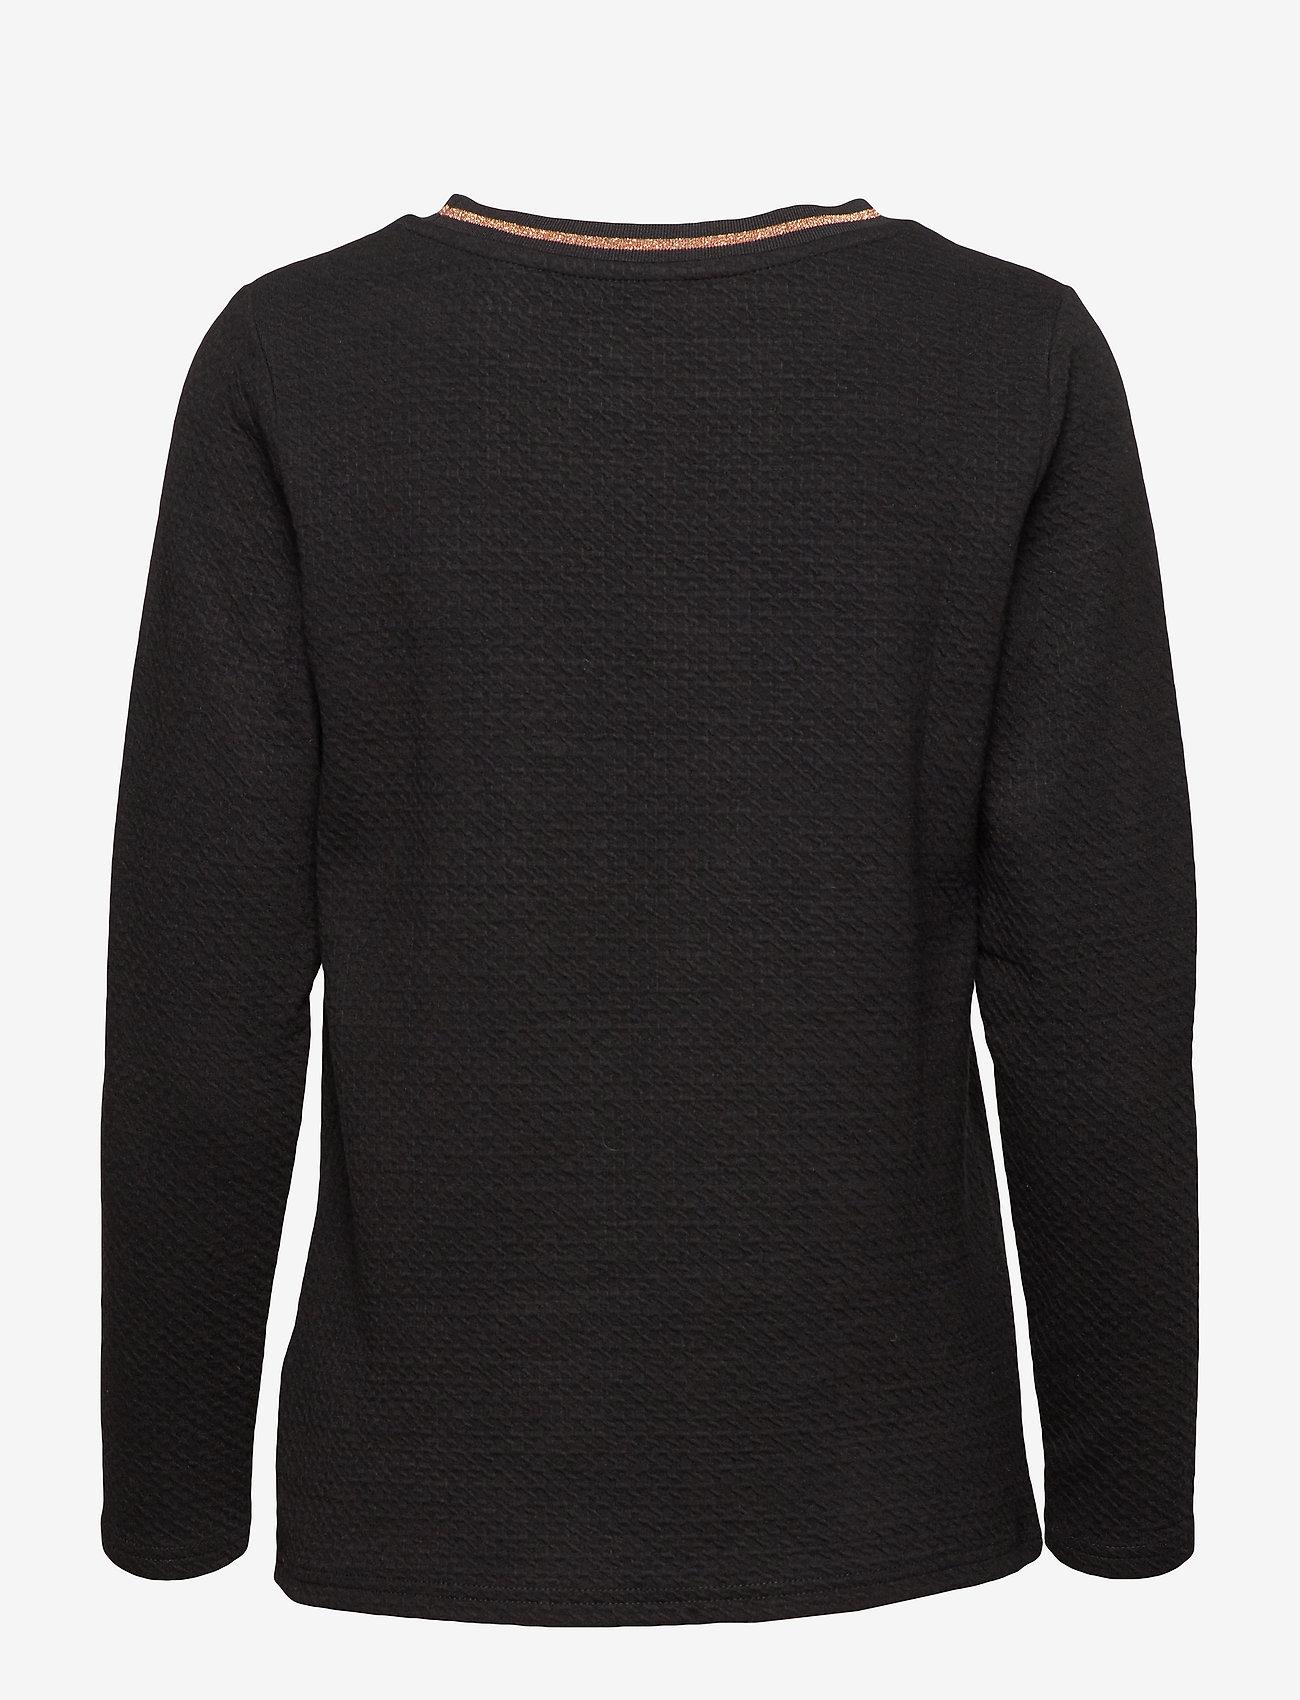 Soyaconcept - SC-MENJA - long-sleeved tops - black